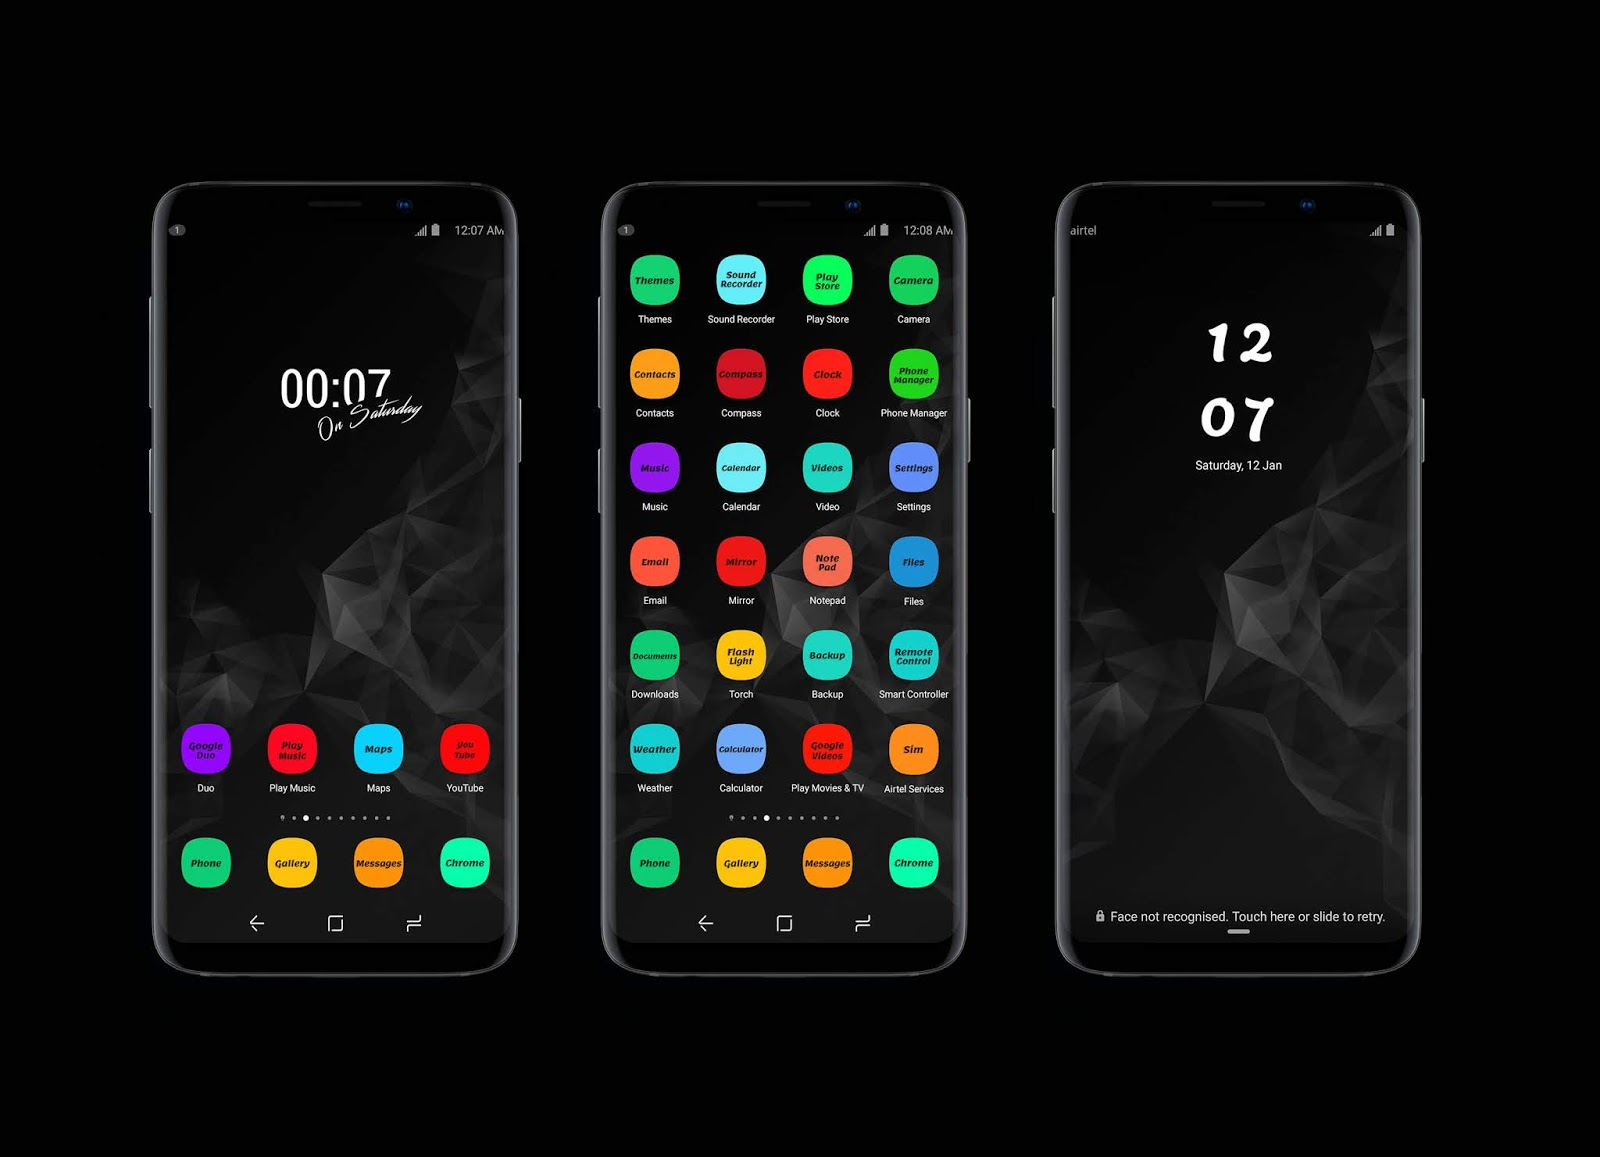 Samsung Text UI For EMUI 5 & EMUI 8 !! Huawei Hwt Theme